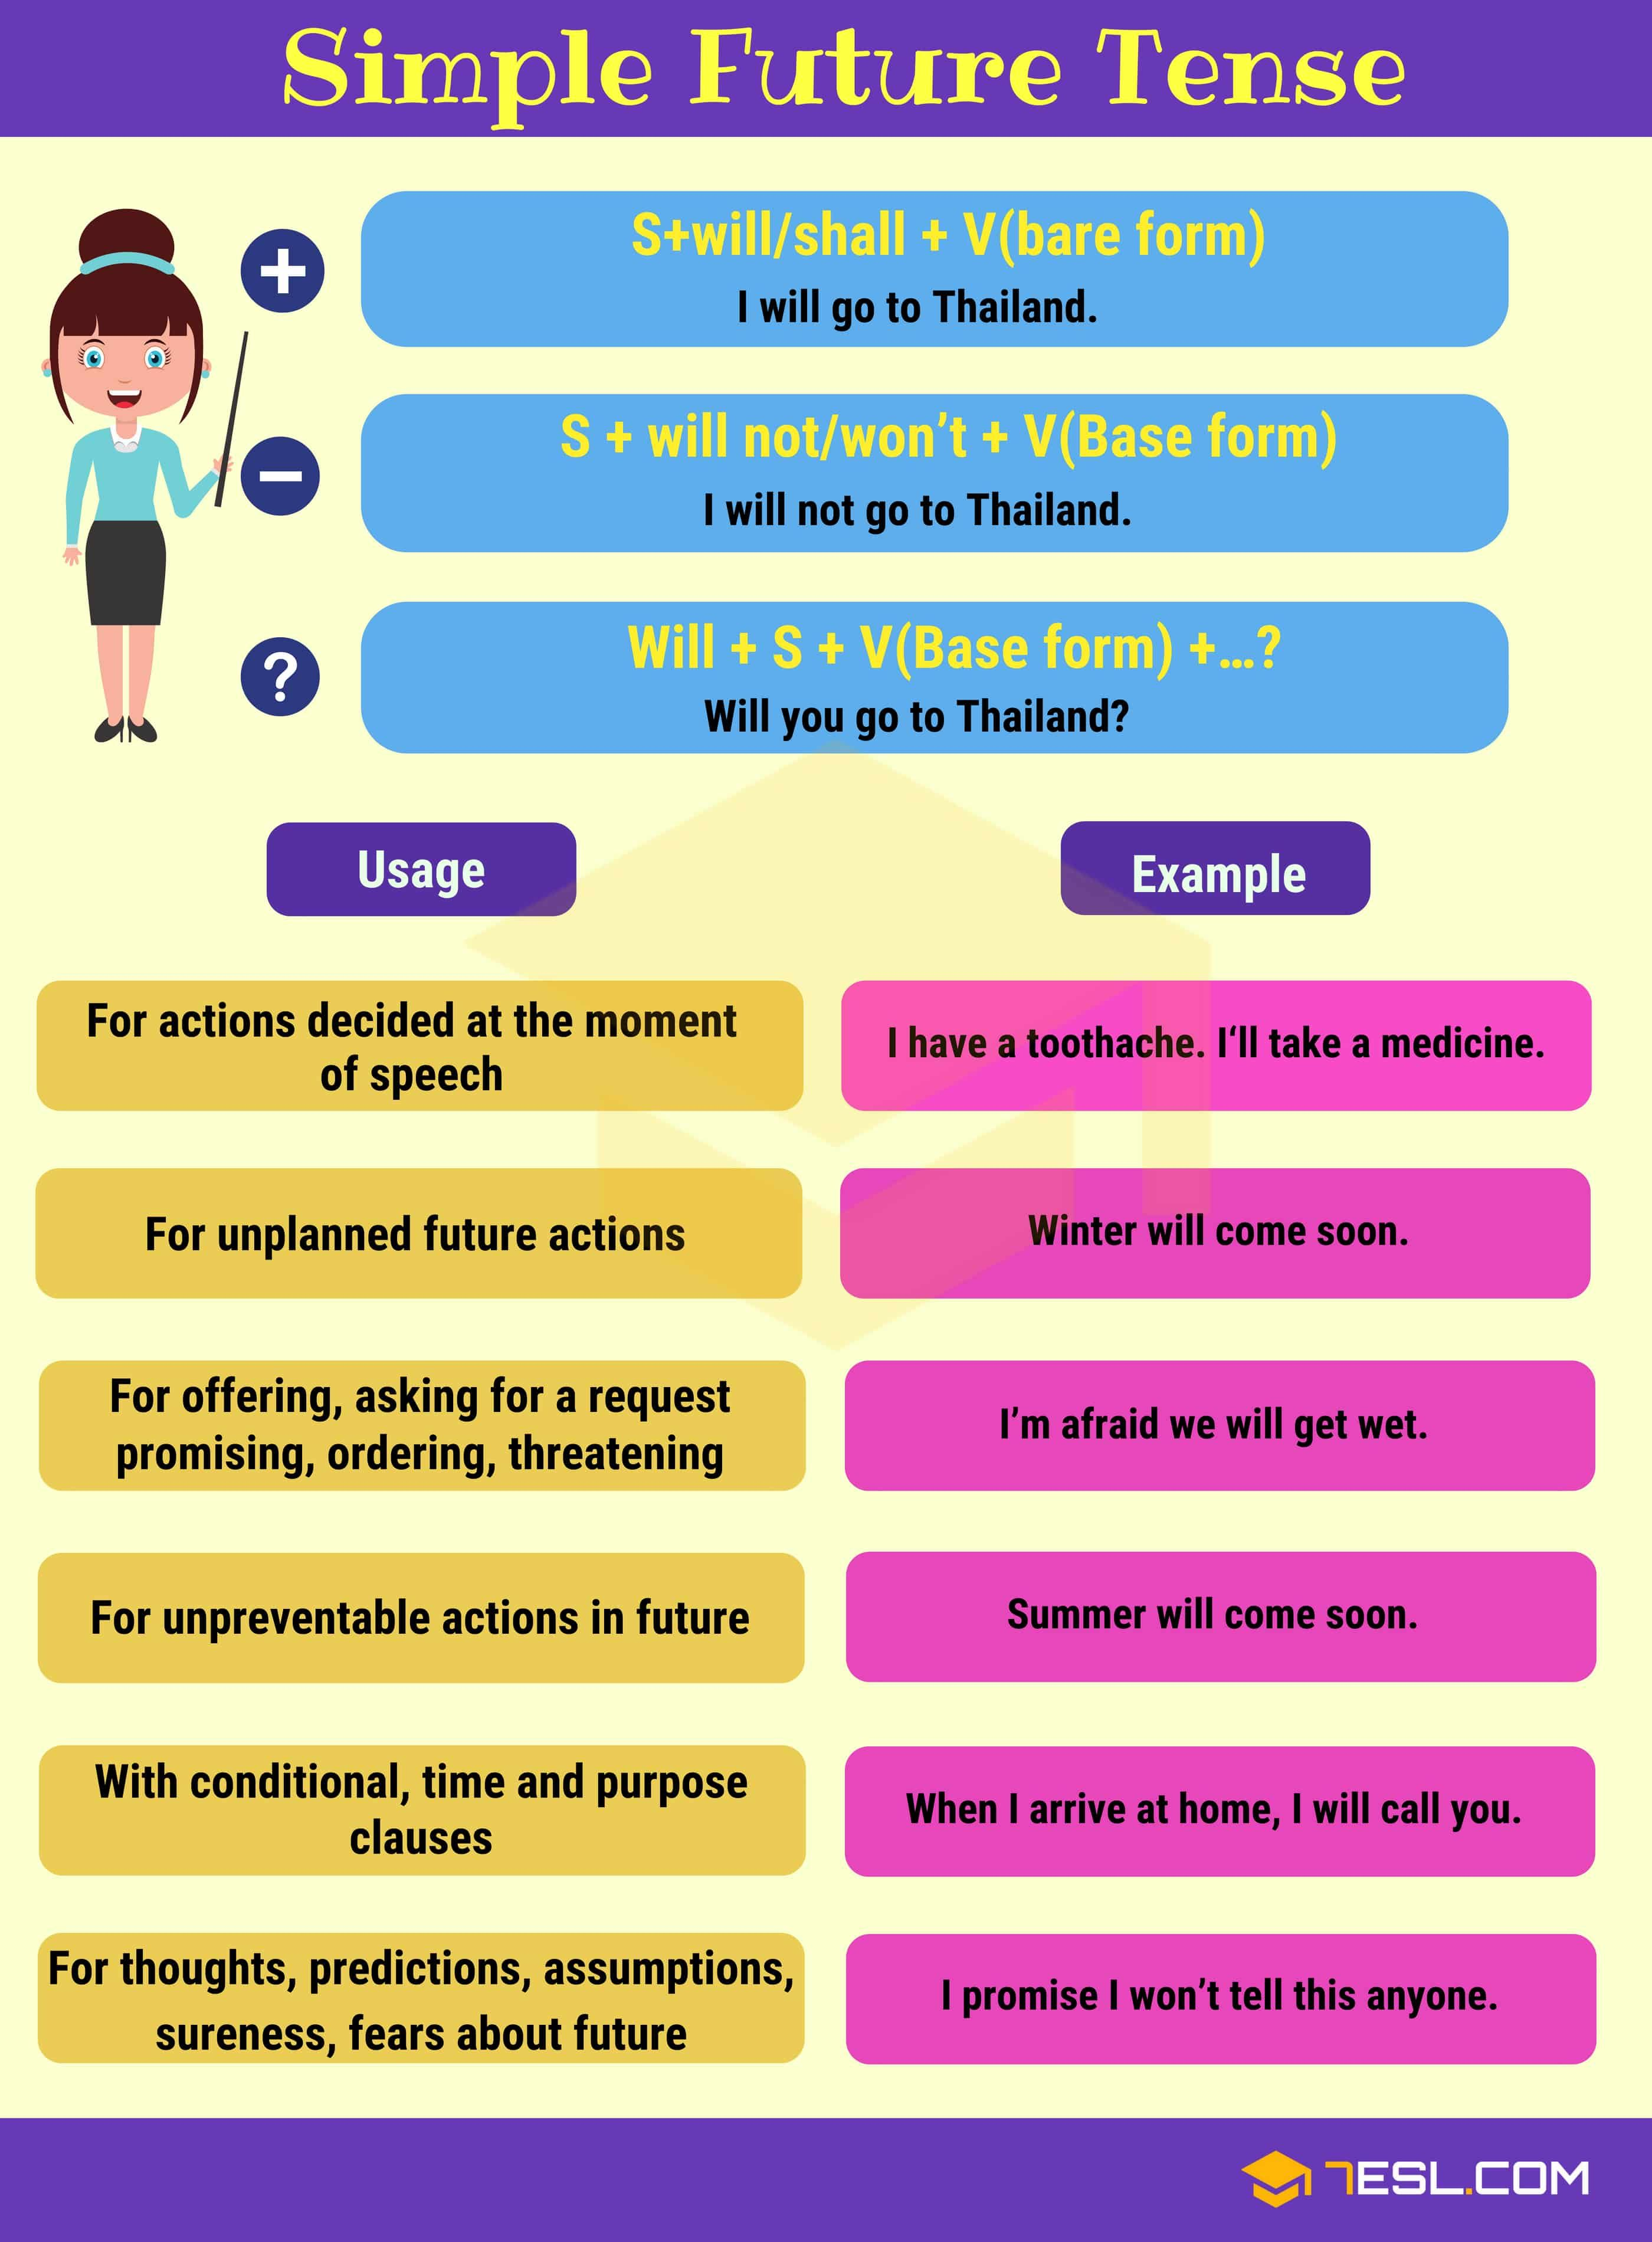 Simple Future Tense Past Tense Worksheet   Printable Worksheets and  Activities for Teachers [ 3800 x 2800 Pixel ]